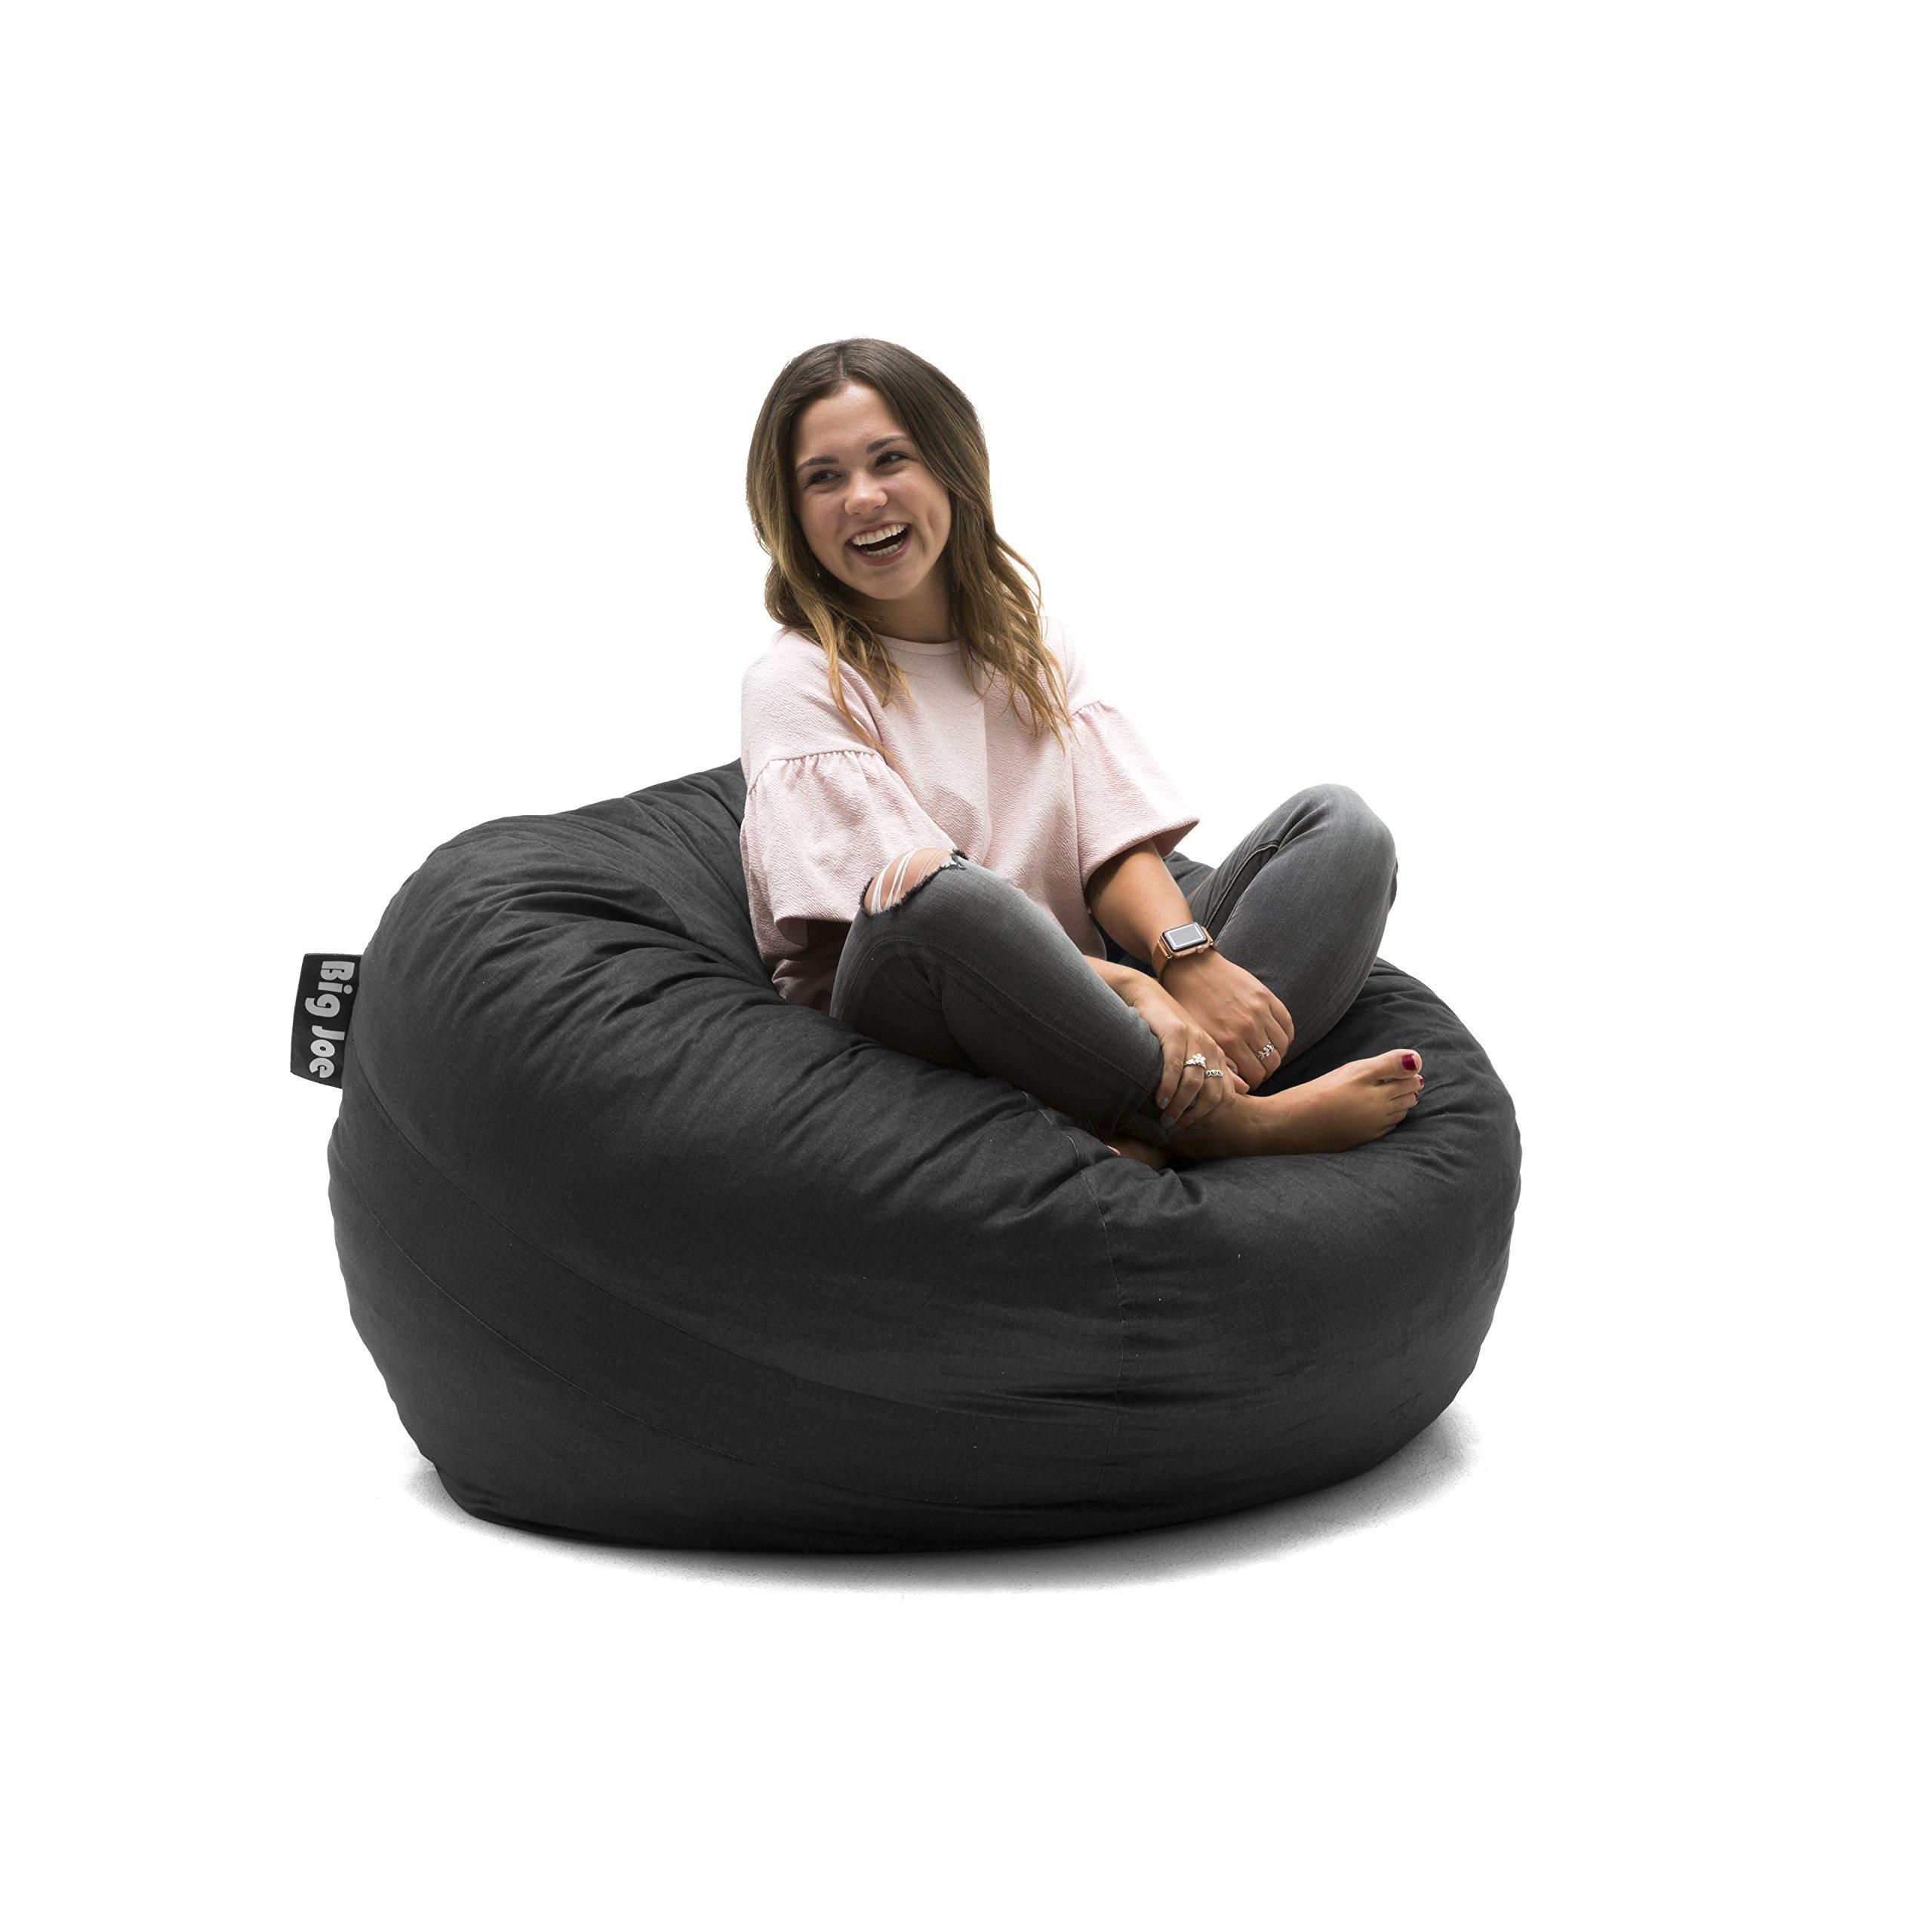 Big Joe Fuf Foam Filled Bean Bag Chair Catalog Furniture